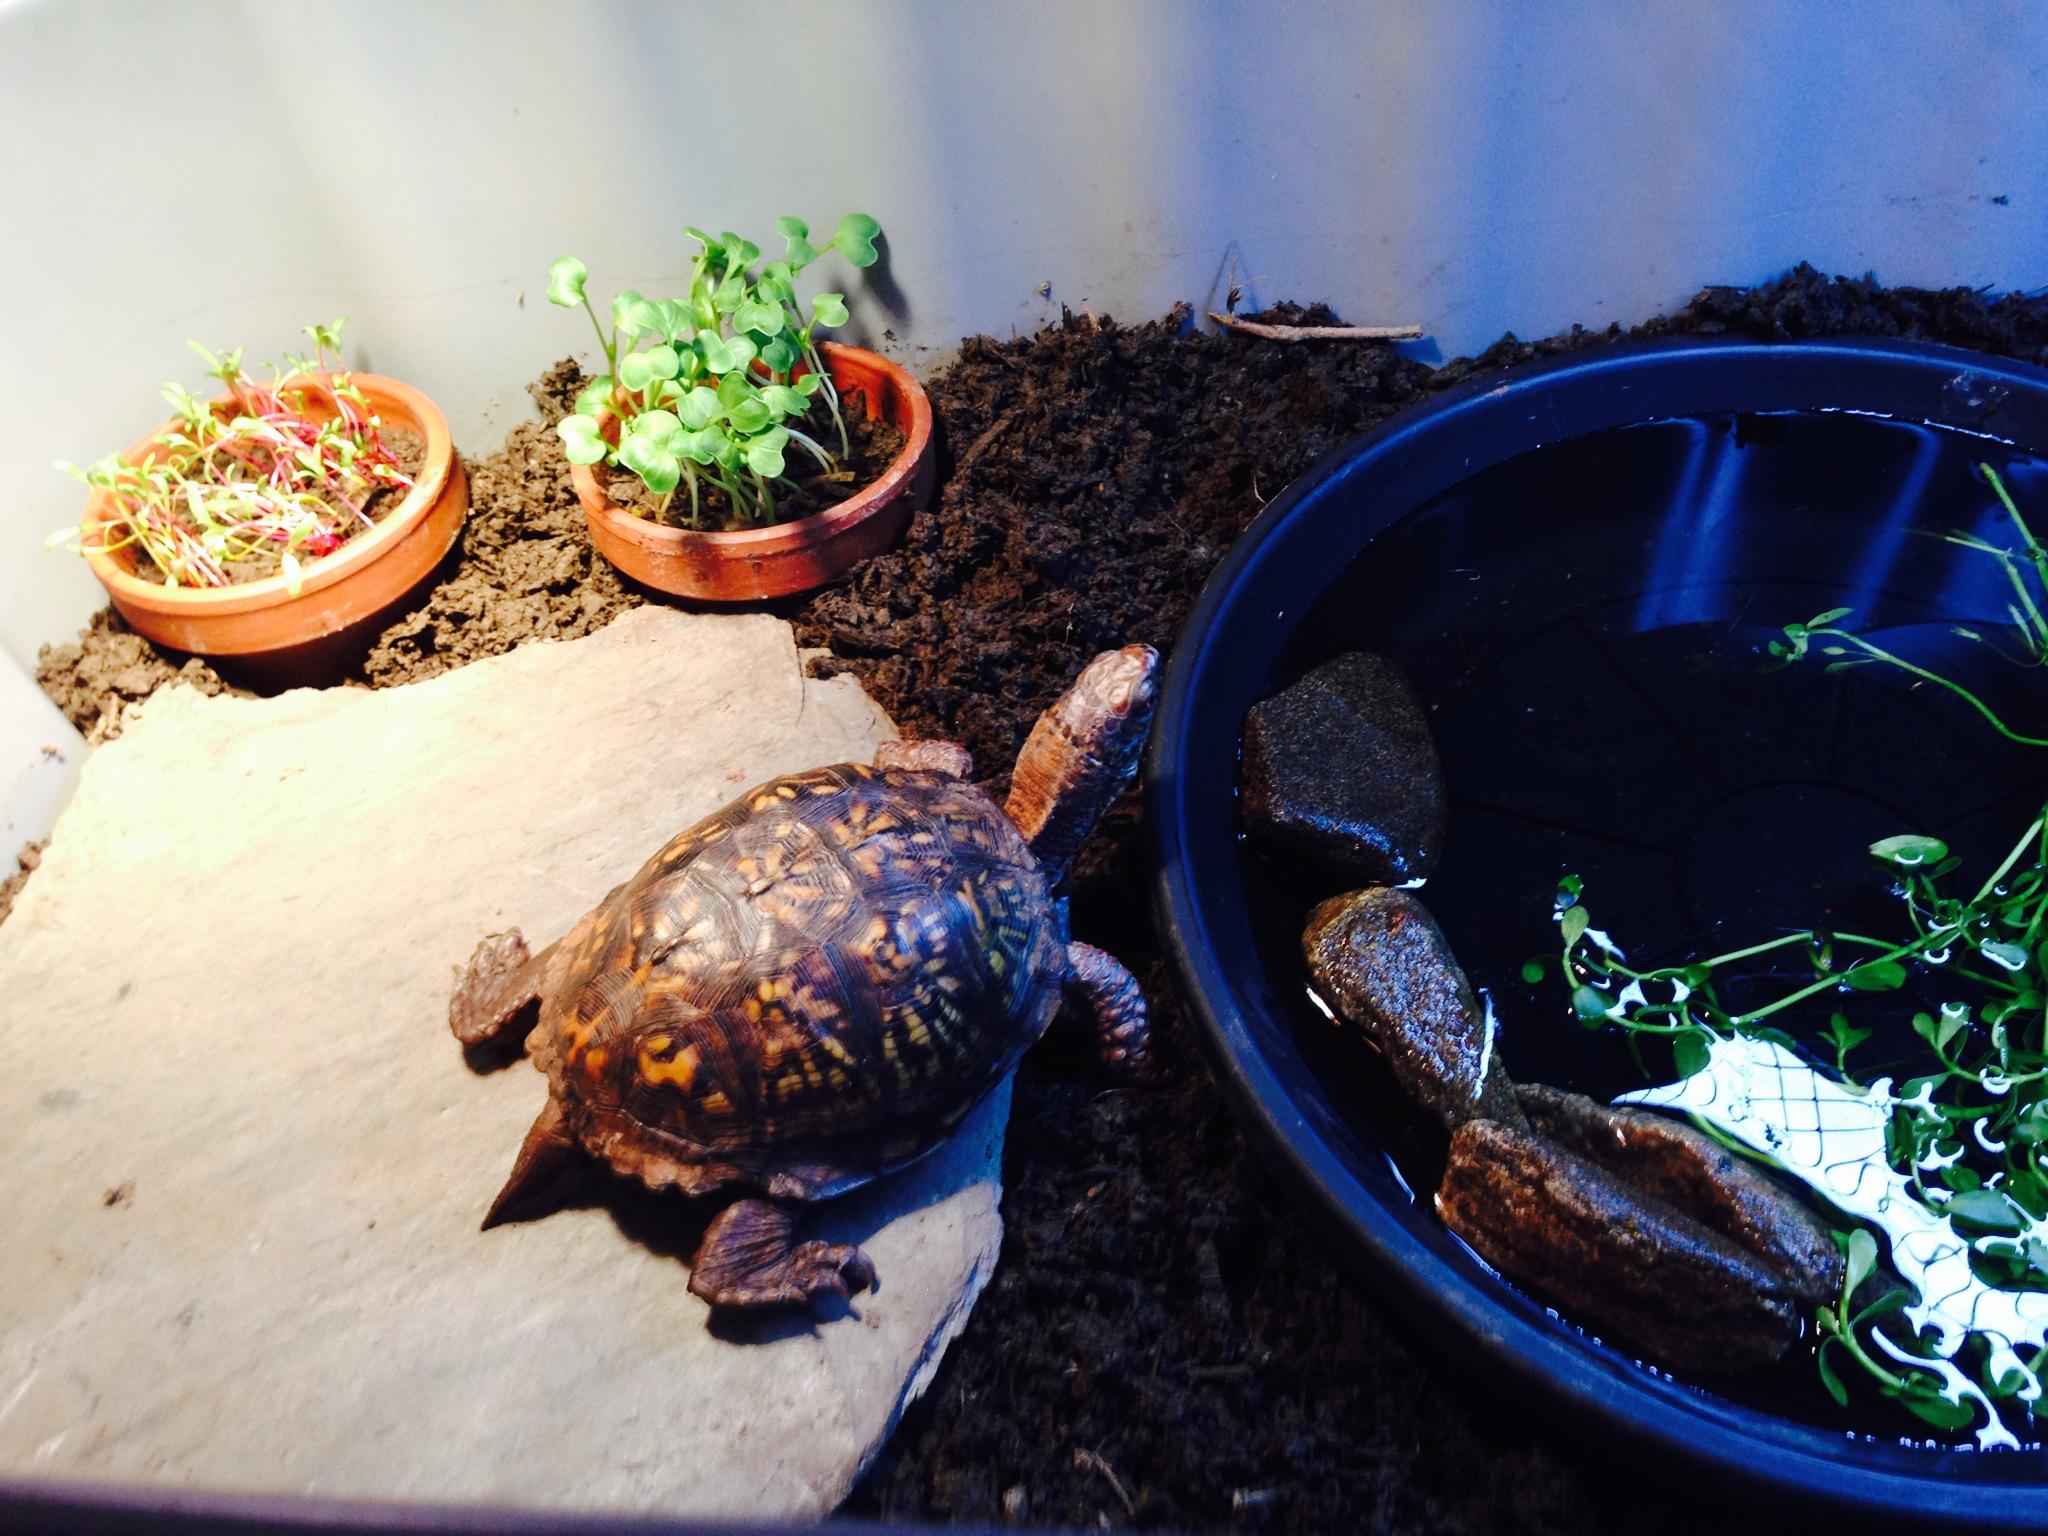 Moreau turtle Daryle eastern box turtle